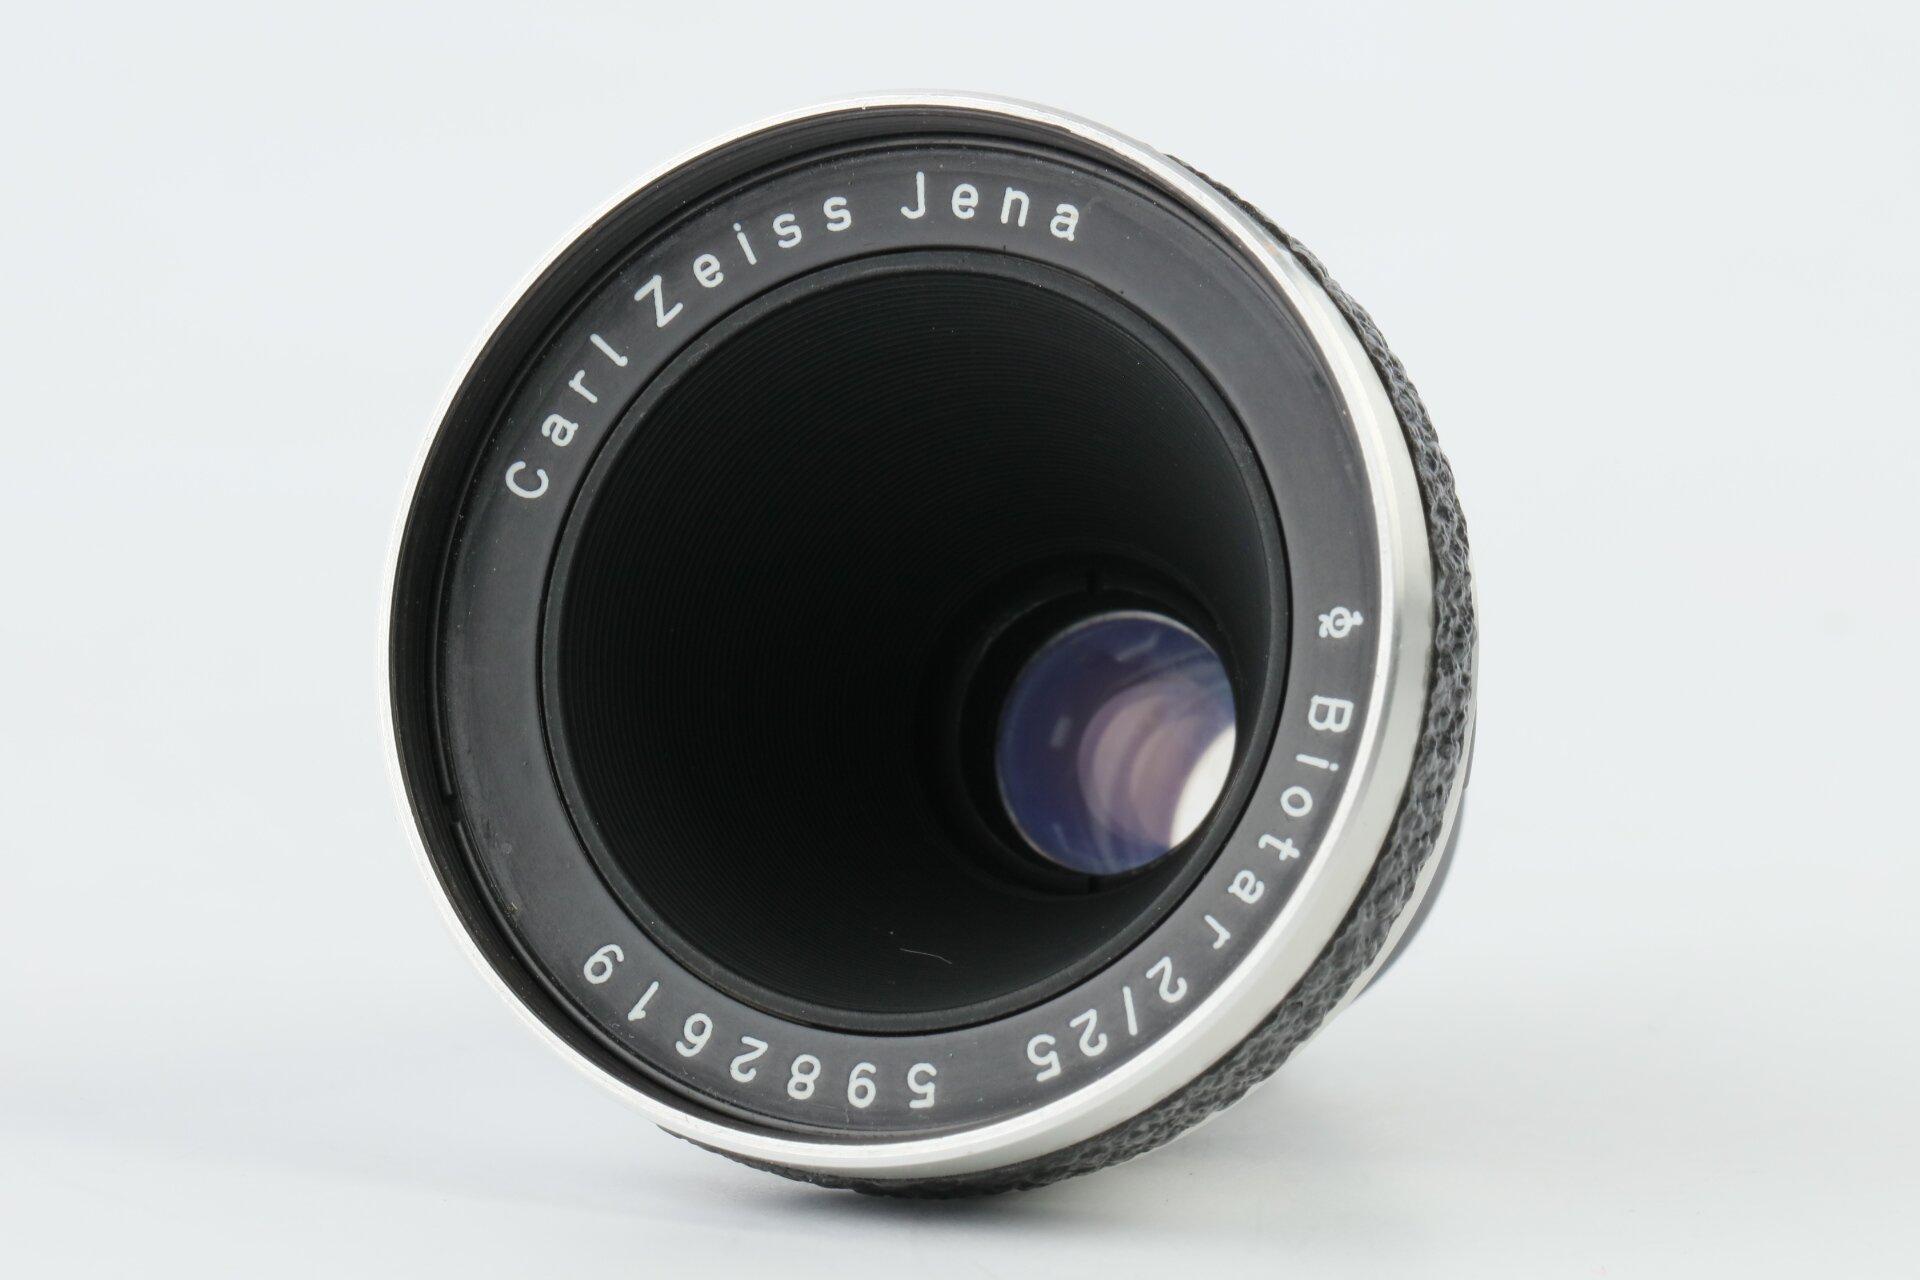 Carl Zeiss Jena Biotar 2/25mm Pentaflex 8